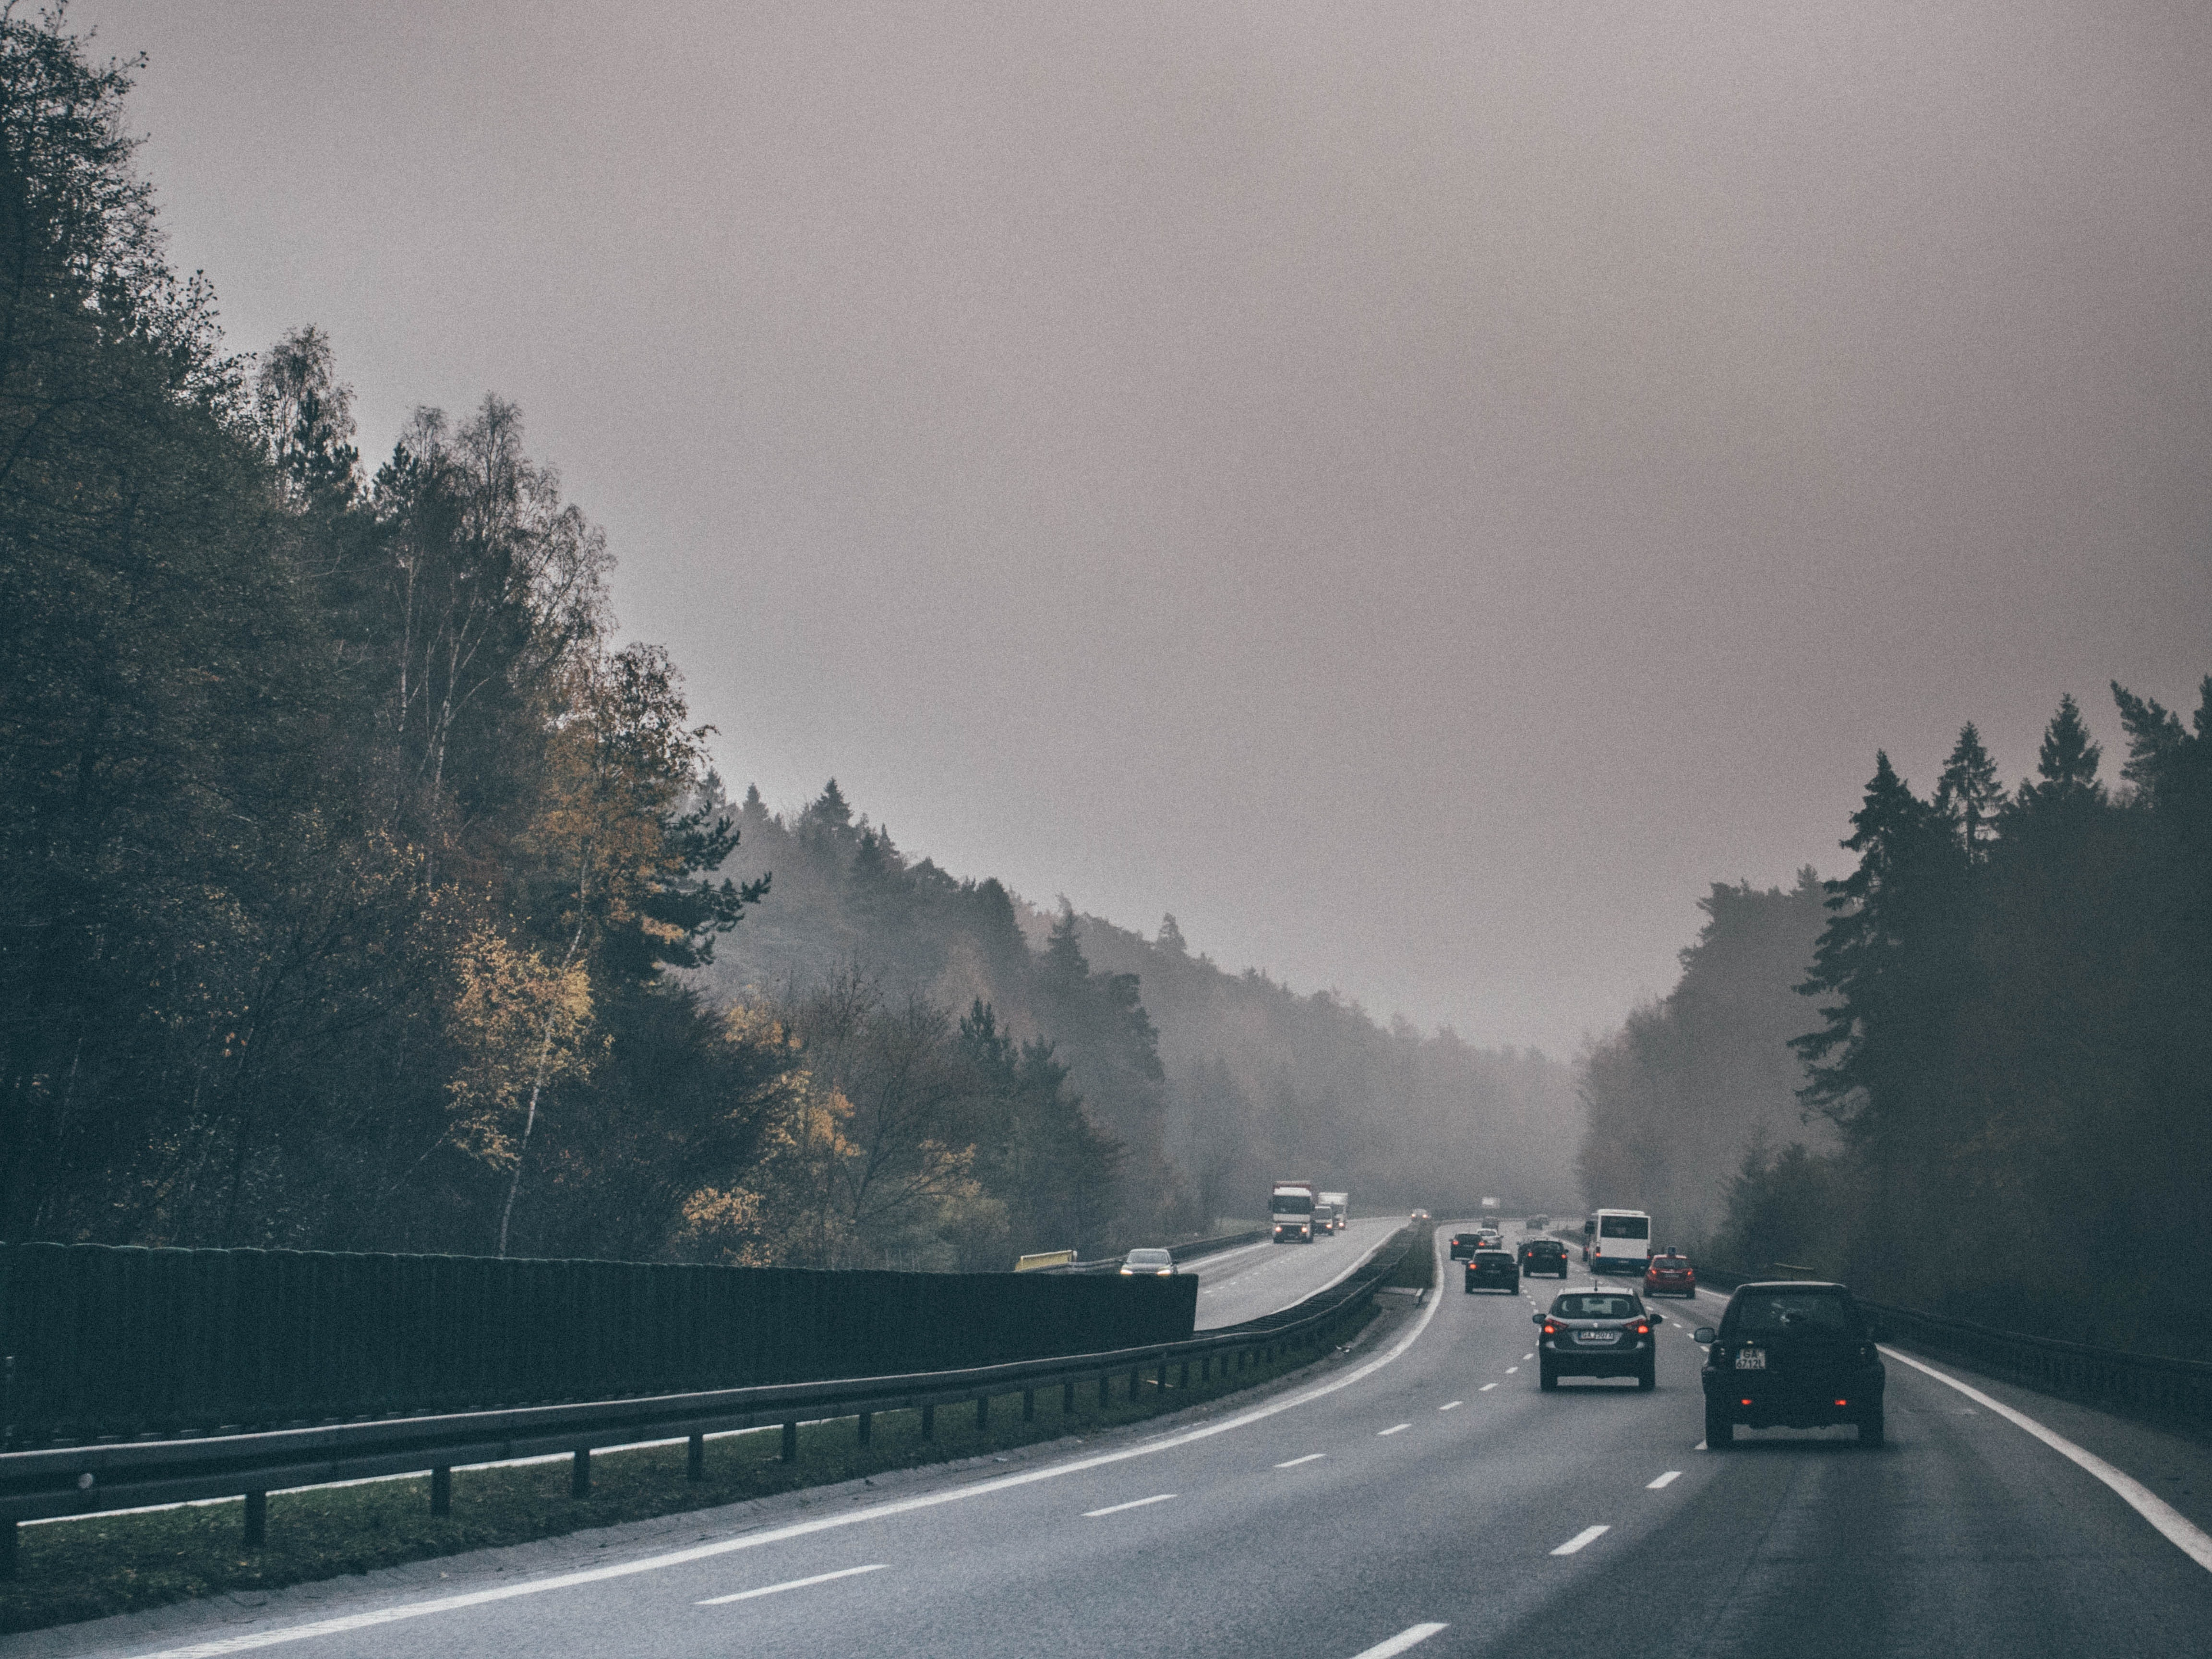 autobahn-cars-motorway-16488